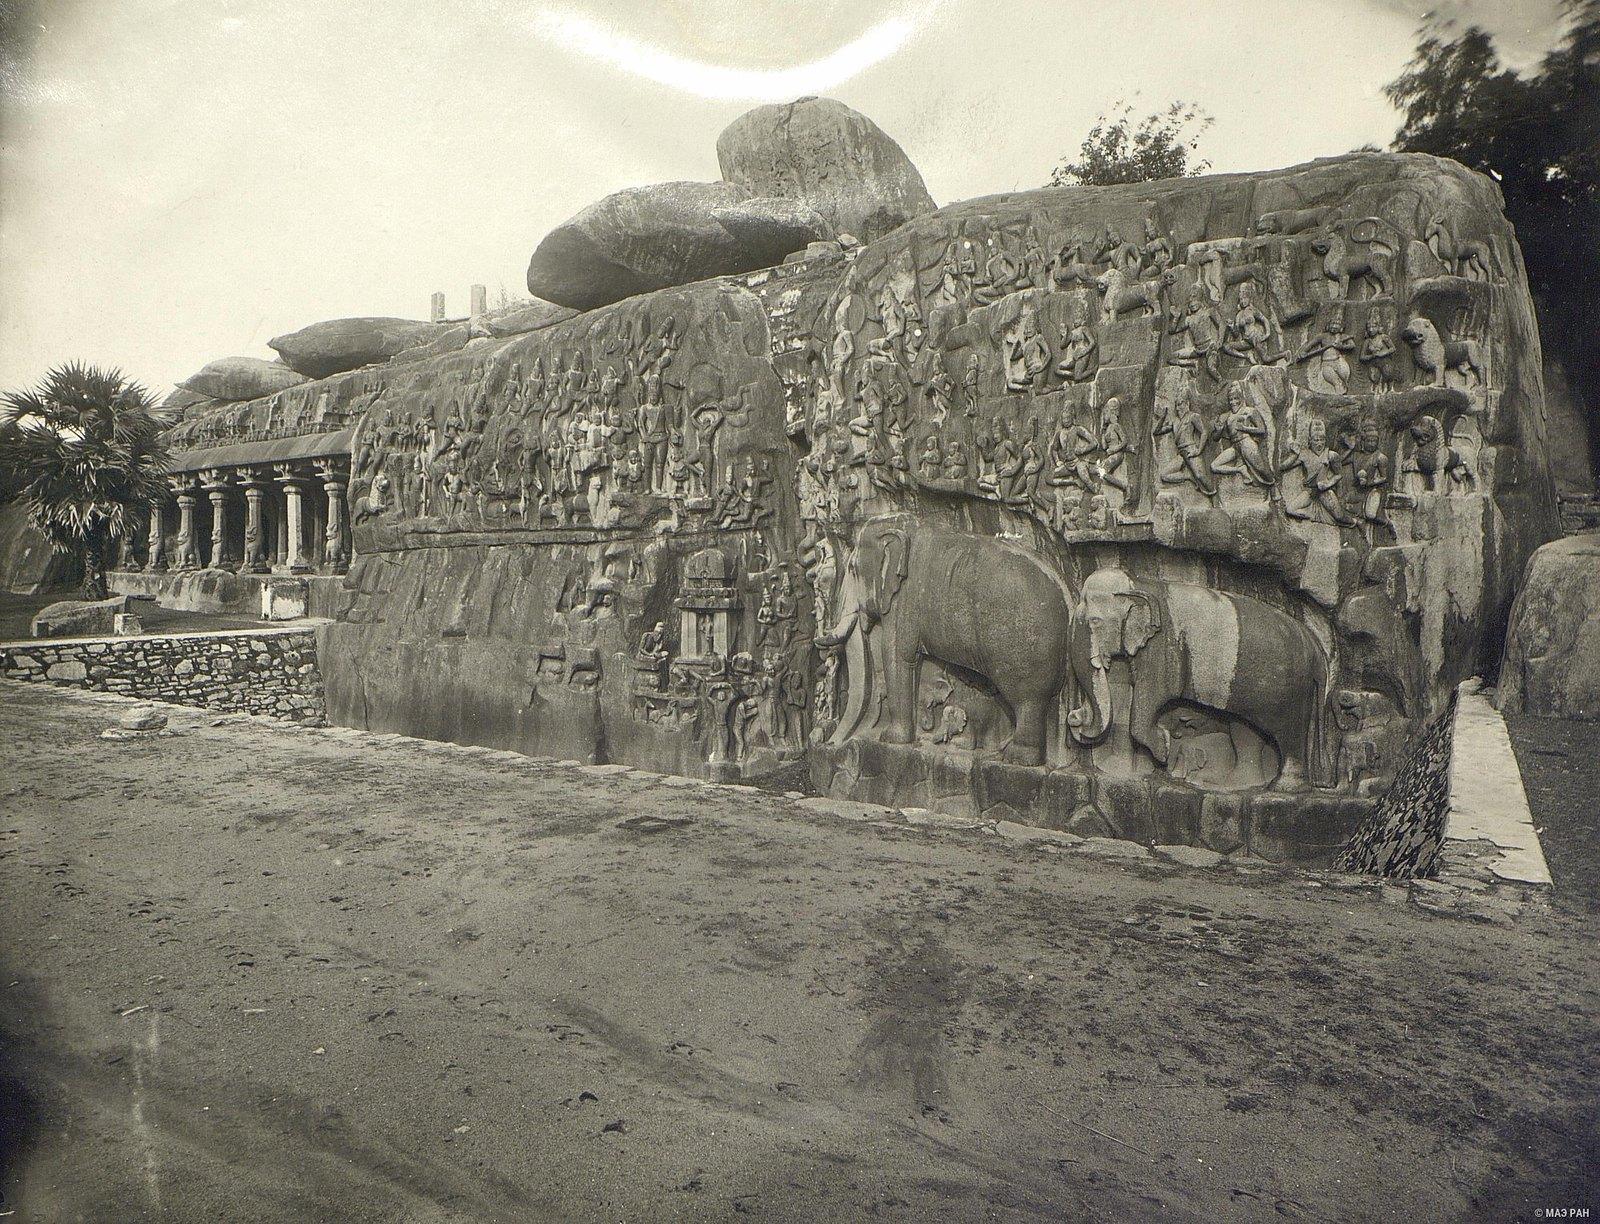 Мамаллапур (общий вид пещерного храма)